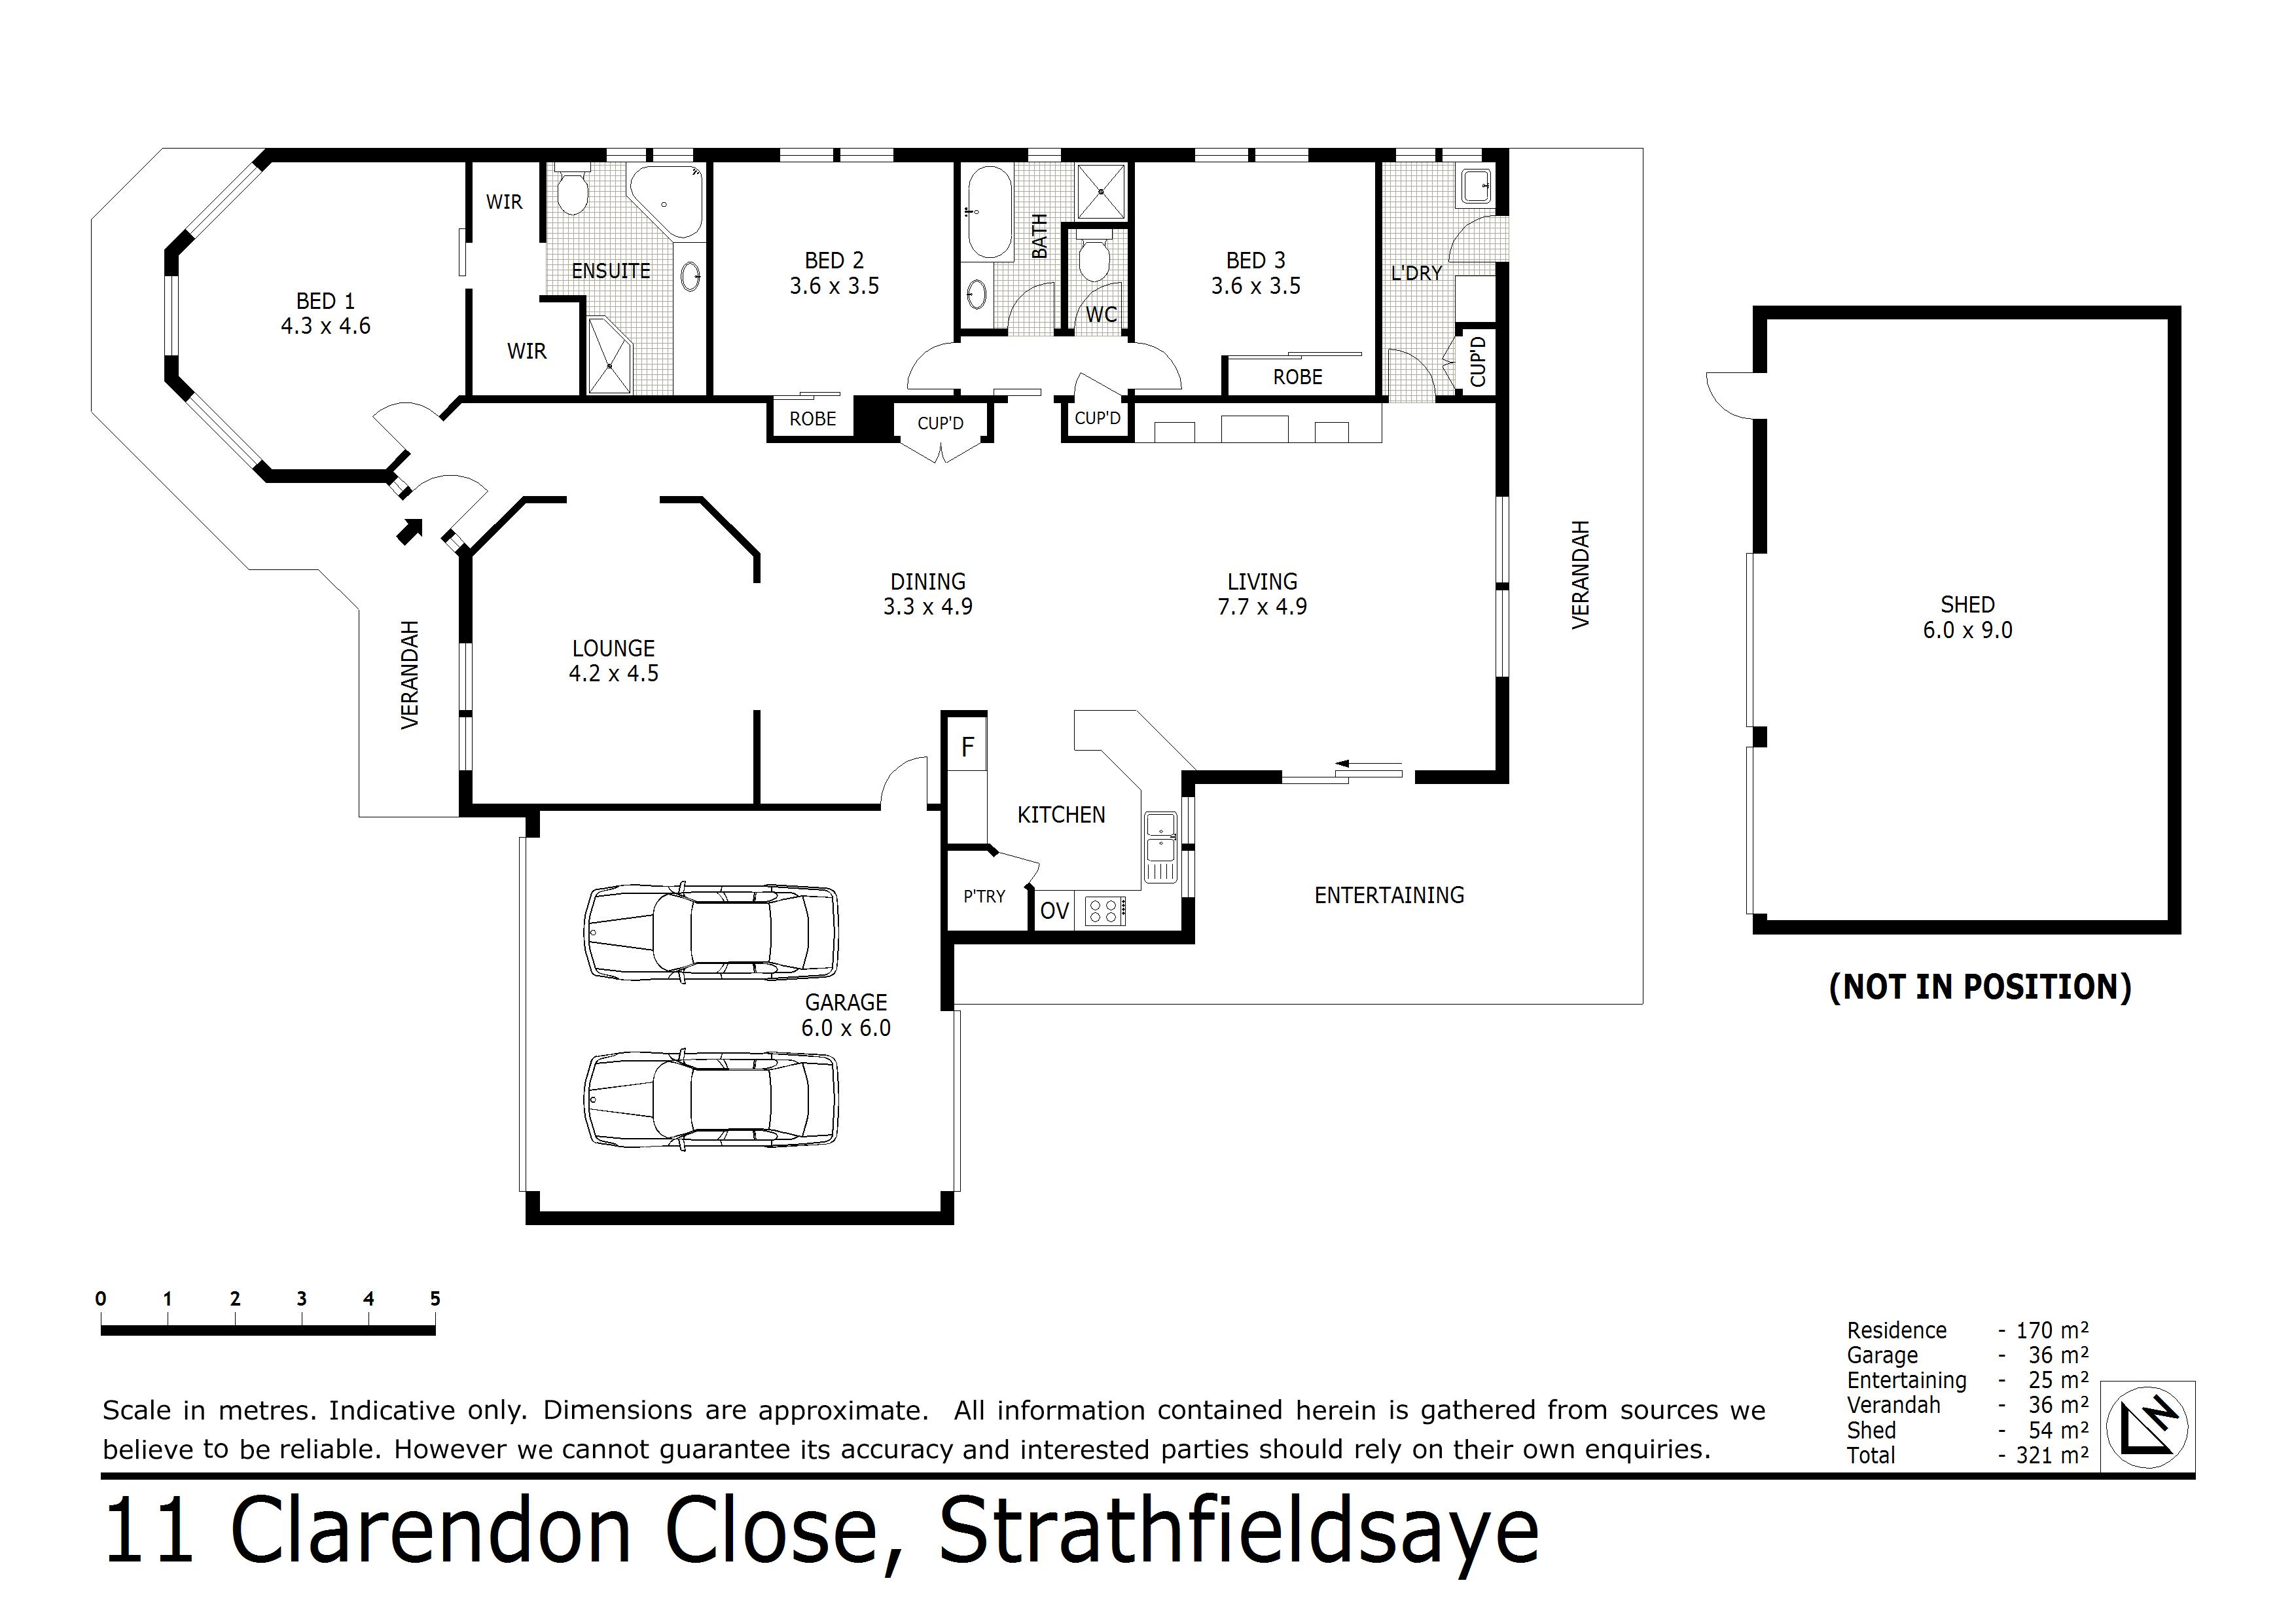 11 Clarendon Close, Strathfieldsaye, VIC 3551